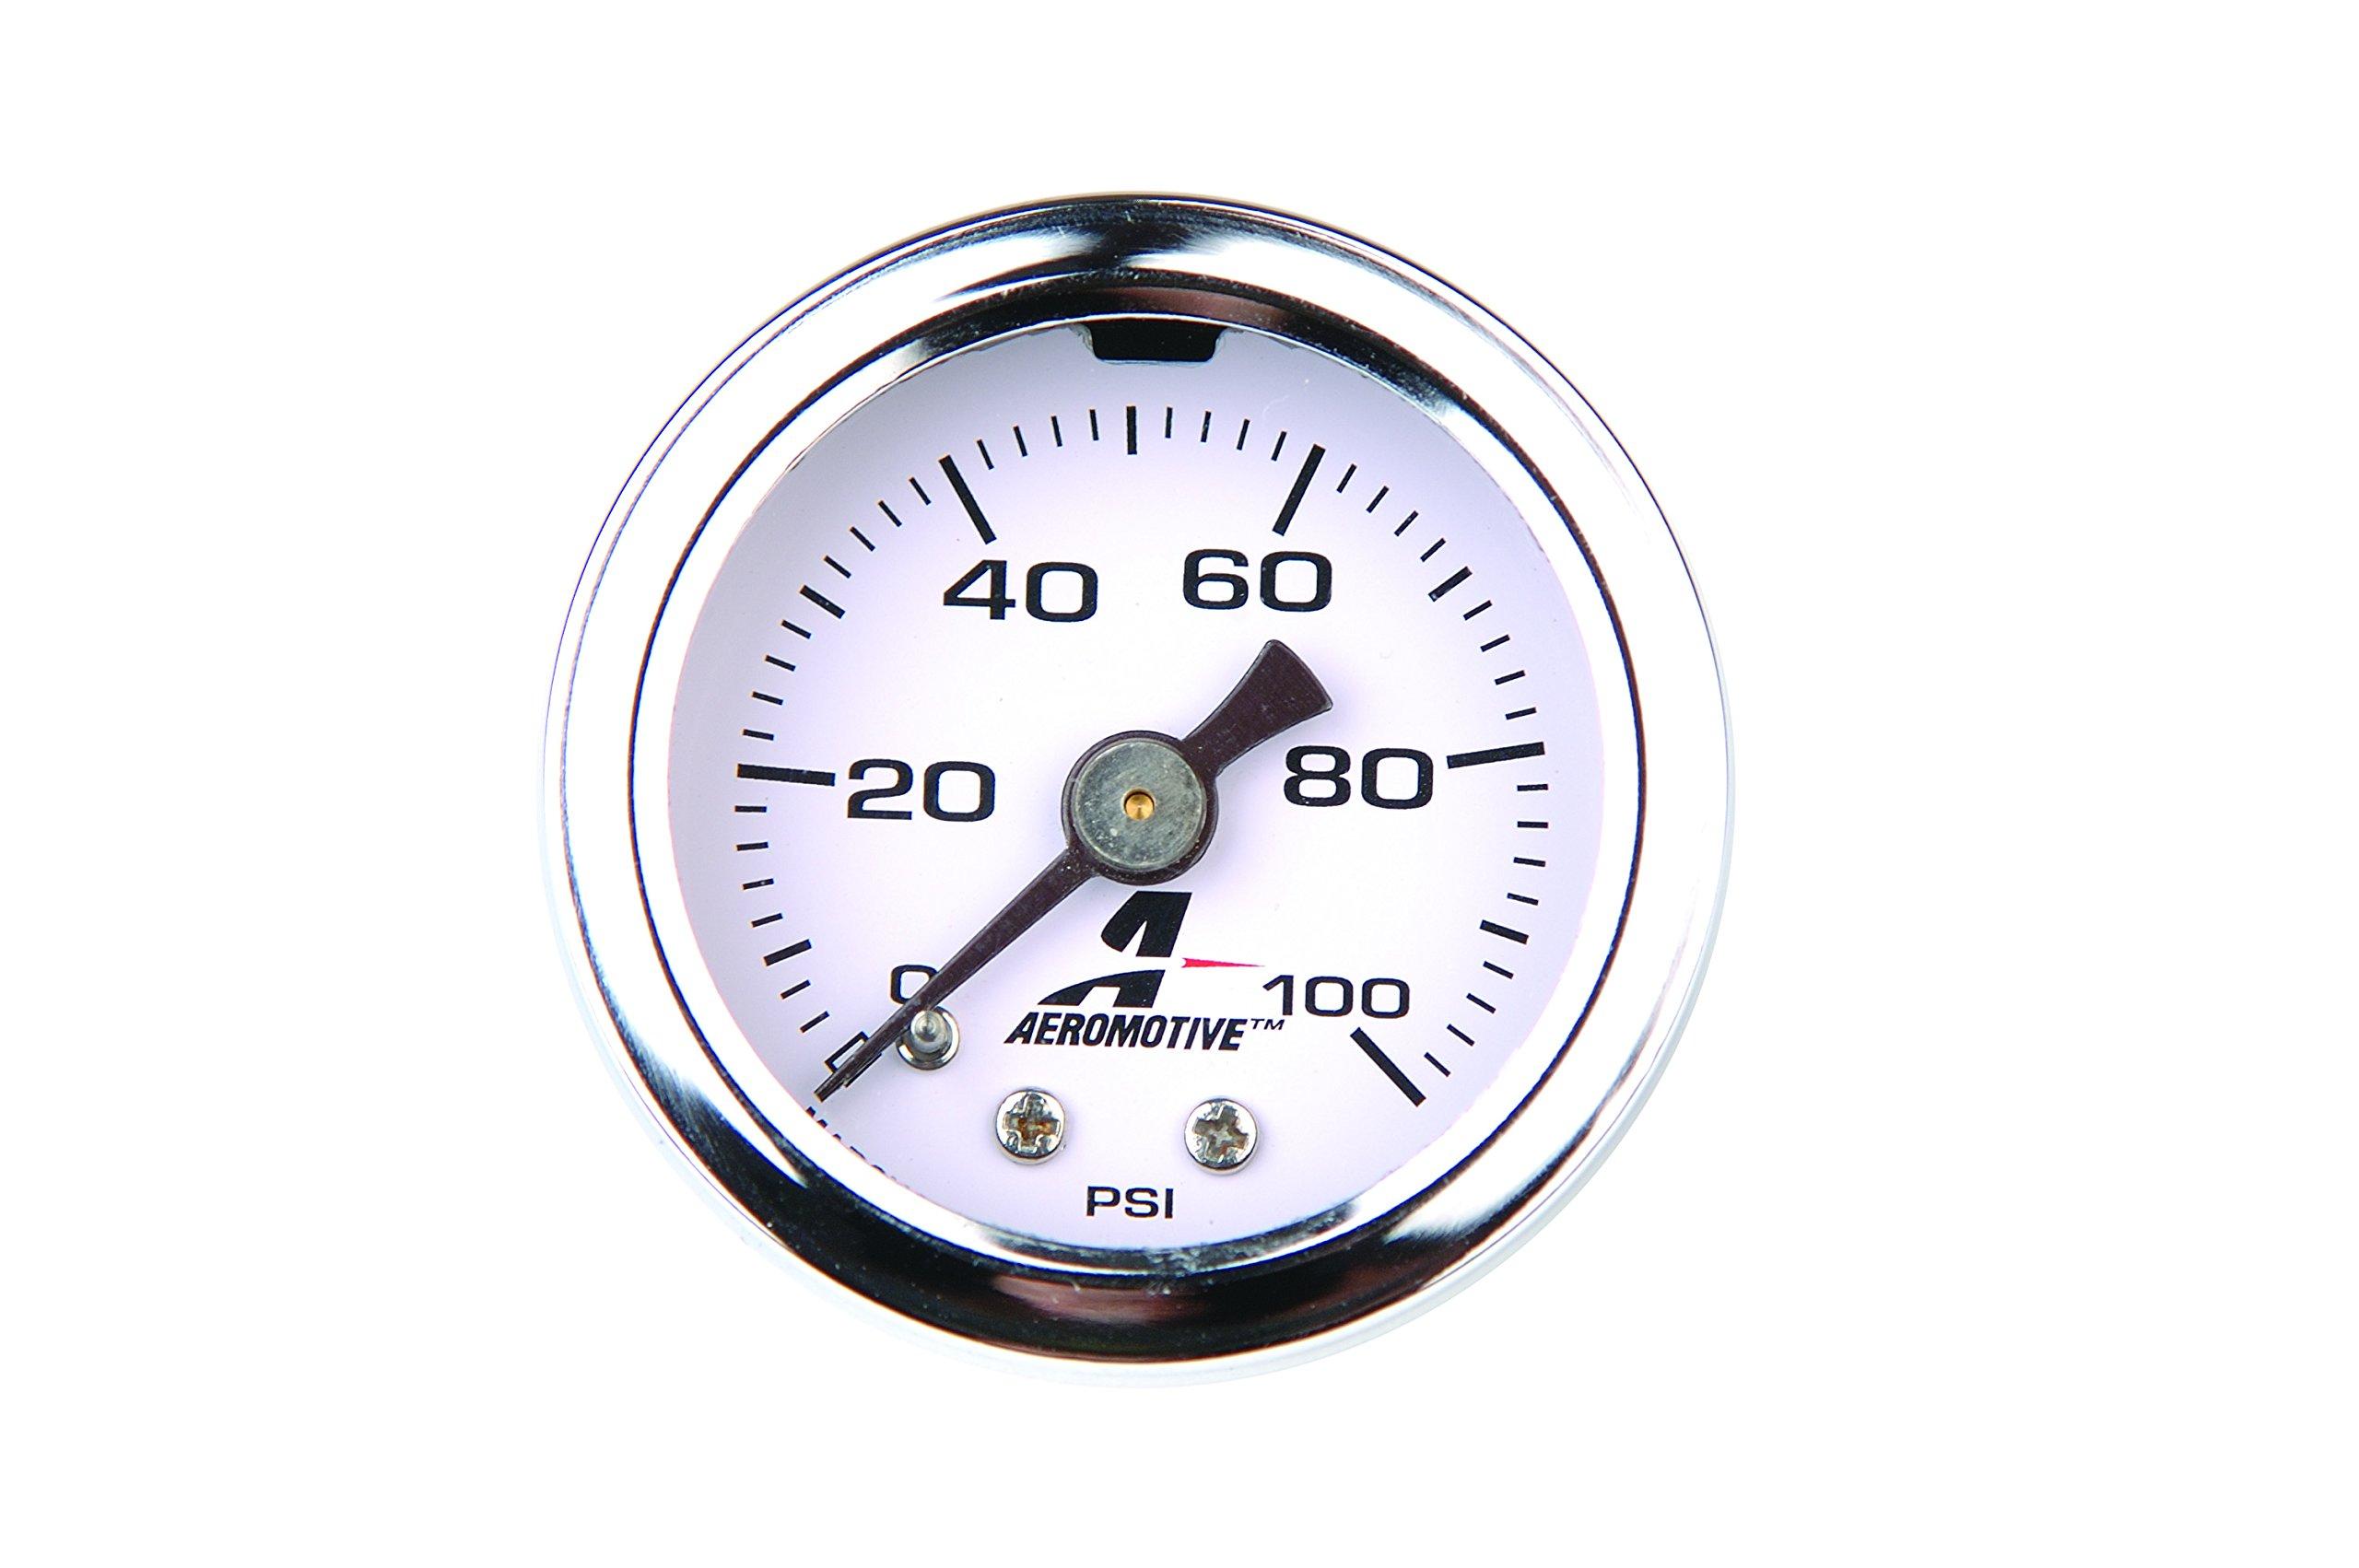 Aeromotive 15633 Fuel Pressure Gauge - 0 to 100 psi by Aeromotive